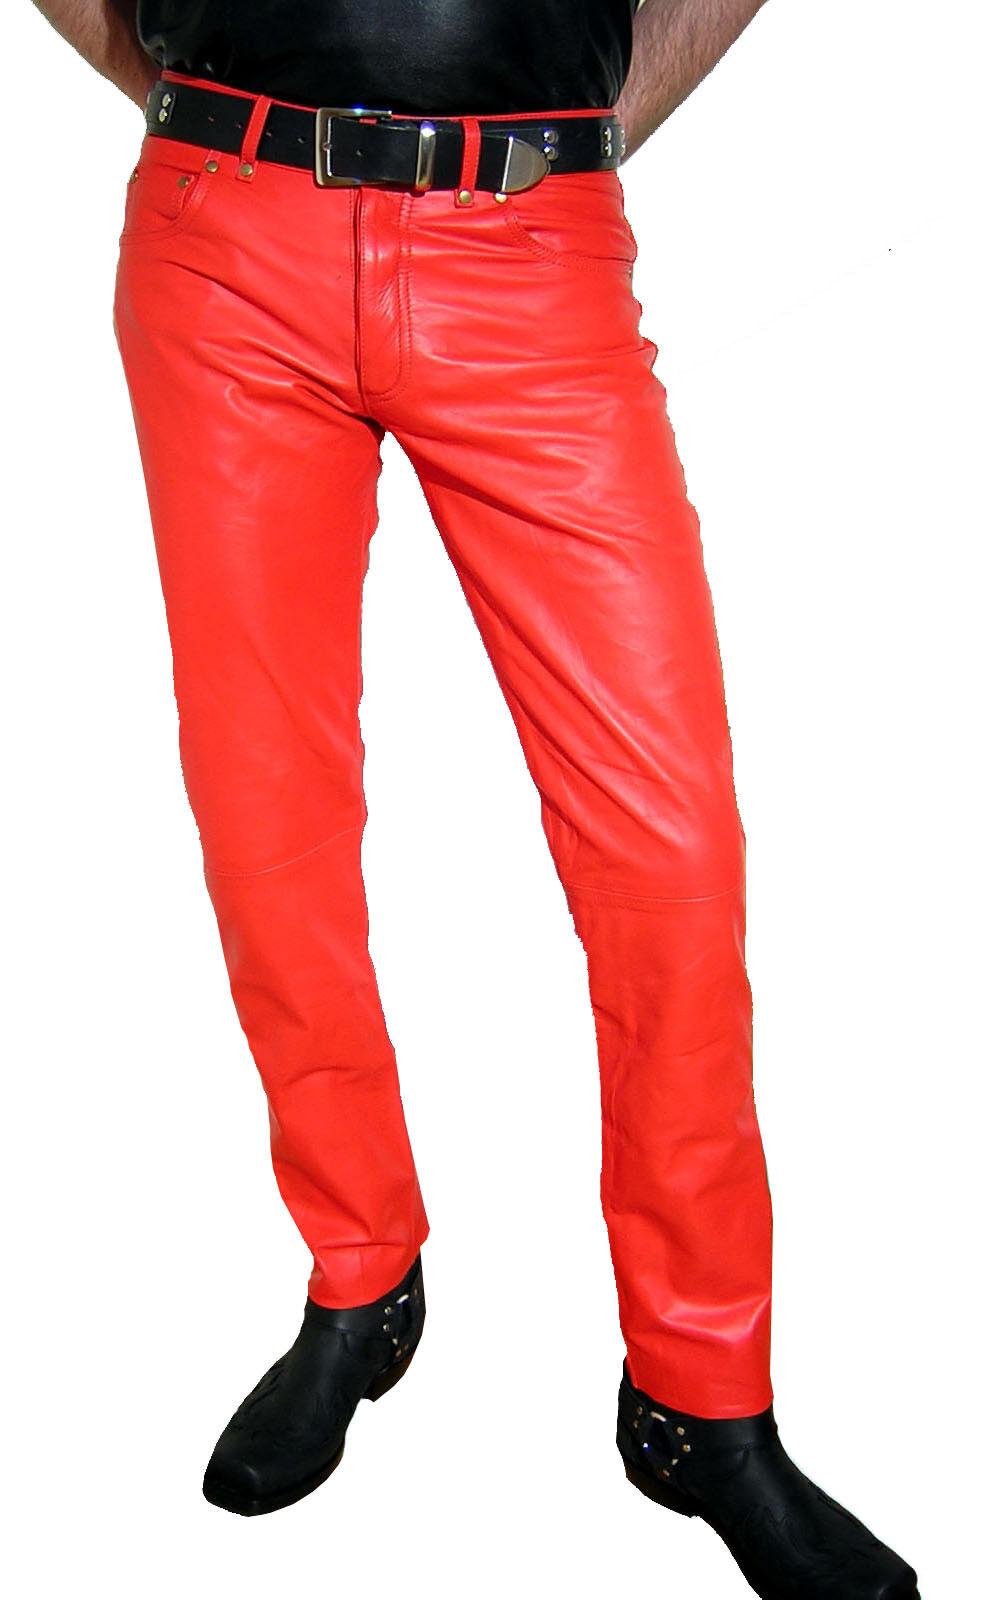 LEDERHOSE rot Lederjeans neu Hose Leder Lustfashion leather trousers pants rot